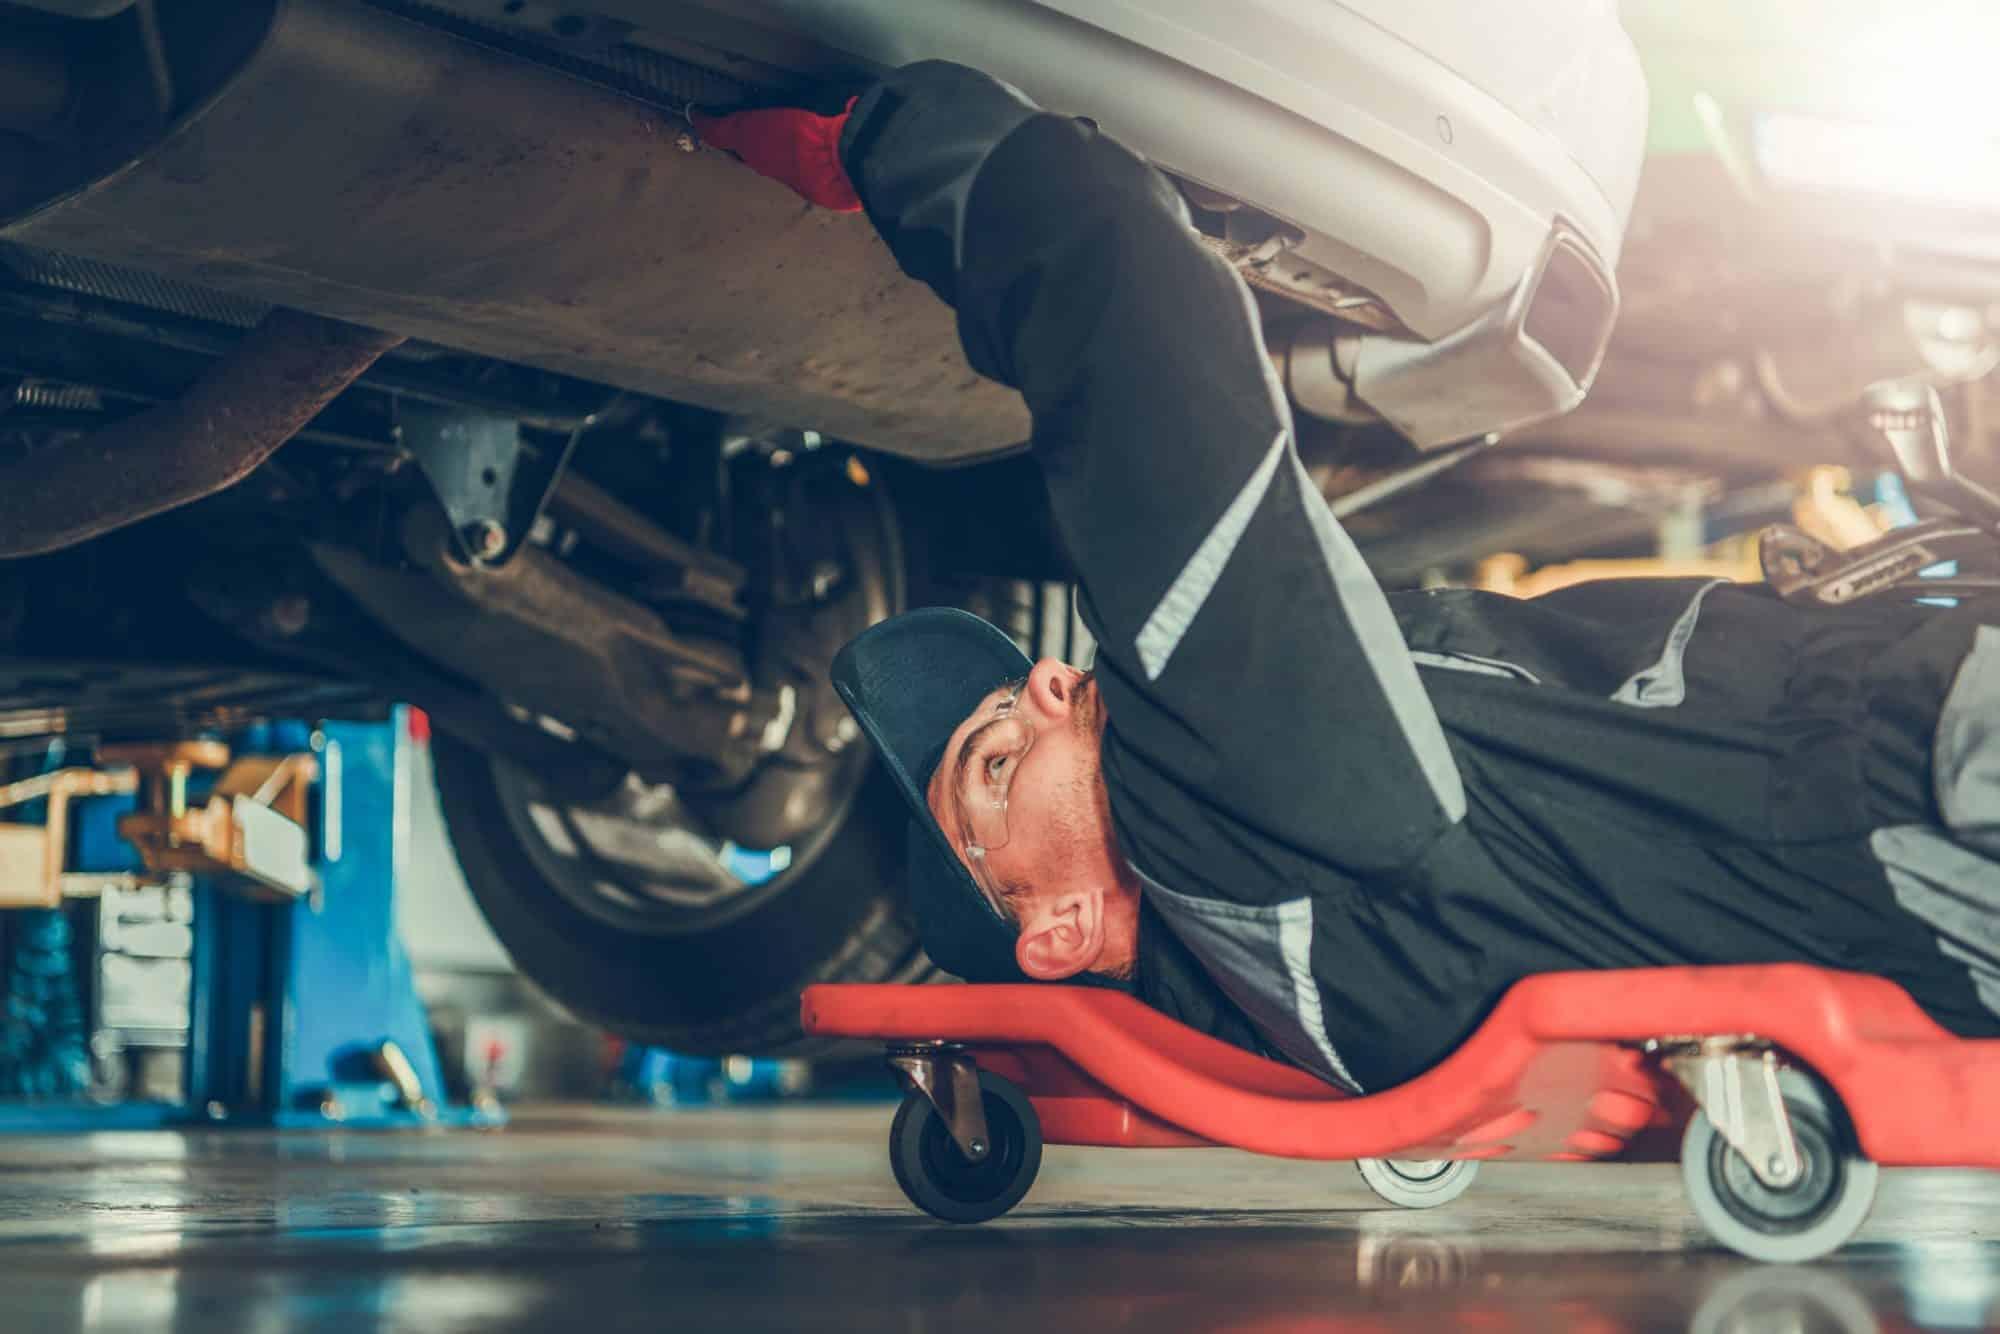 car-mechanic-under-the-car